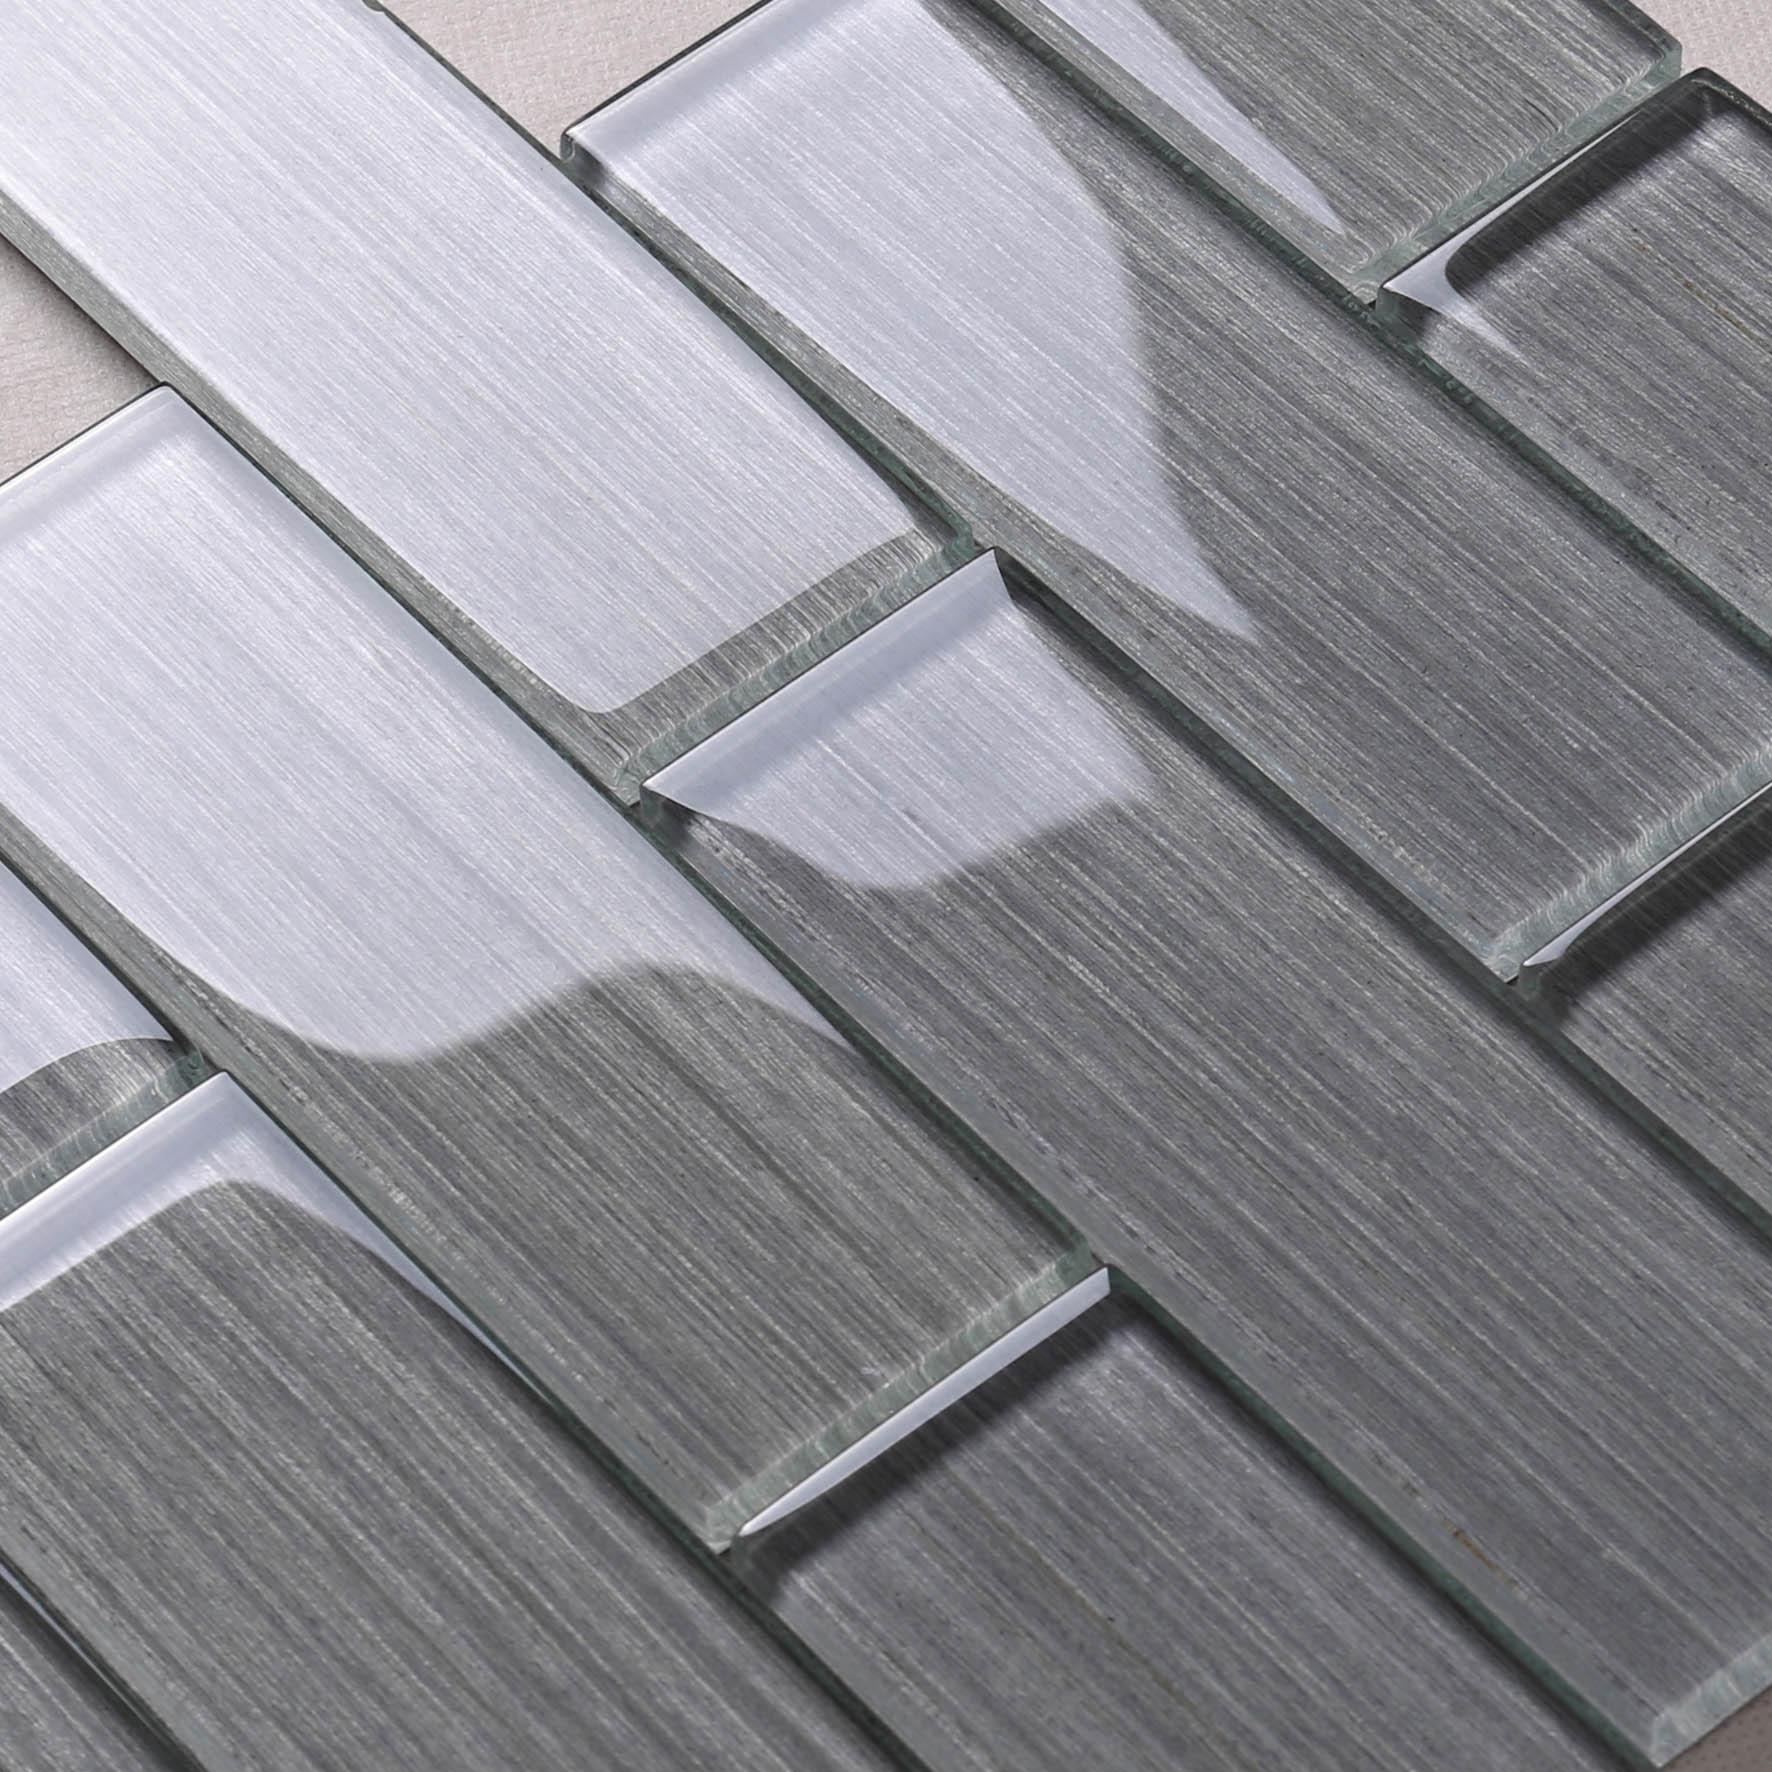 Heng Xing-Glass Wall Tiles, White Glass Backsplash Manufacturer   Glass Mosaic Tile-3